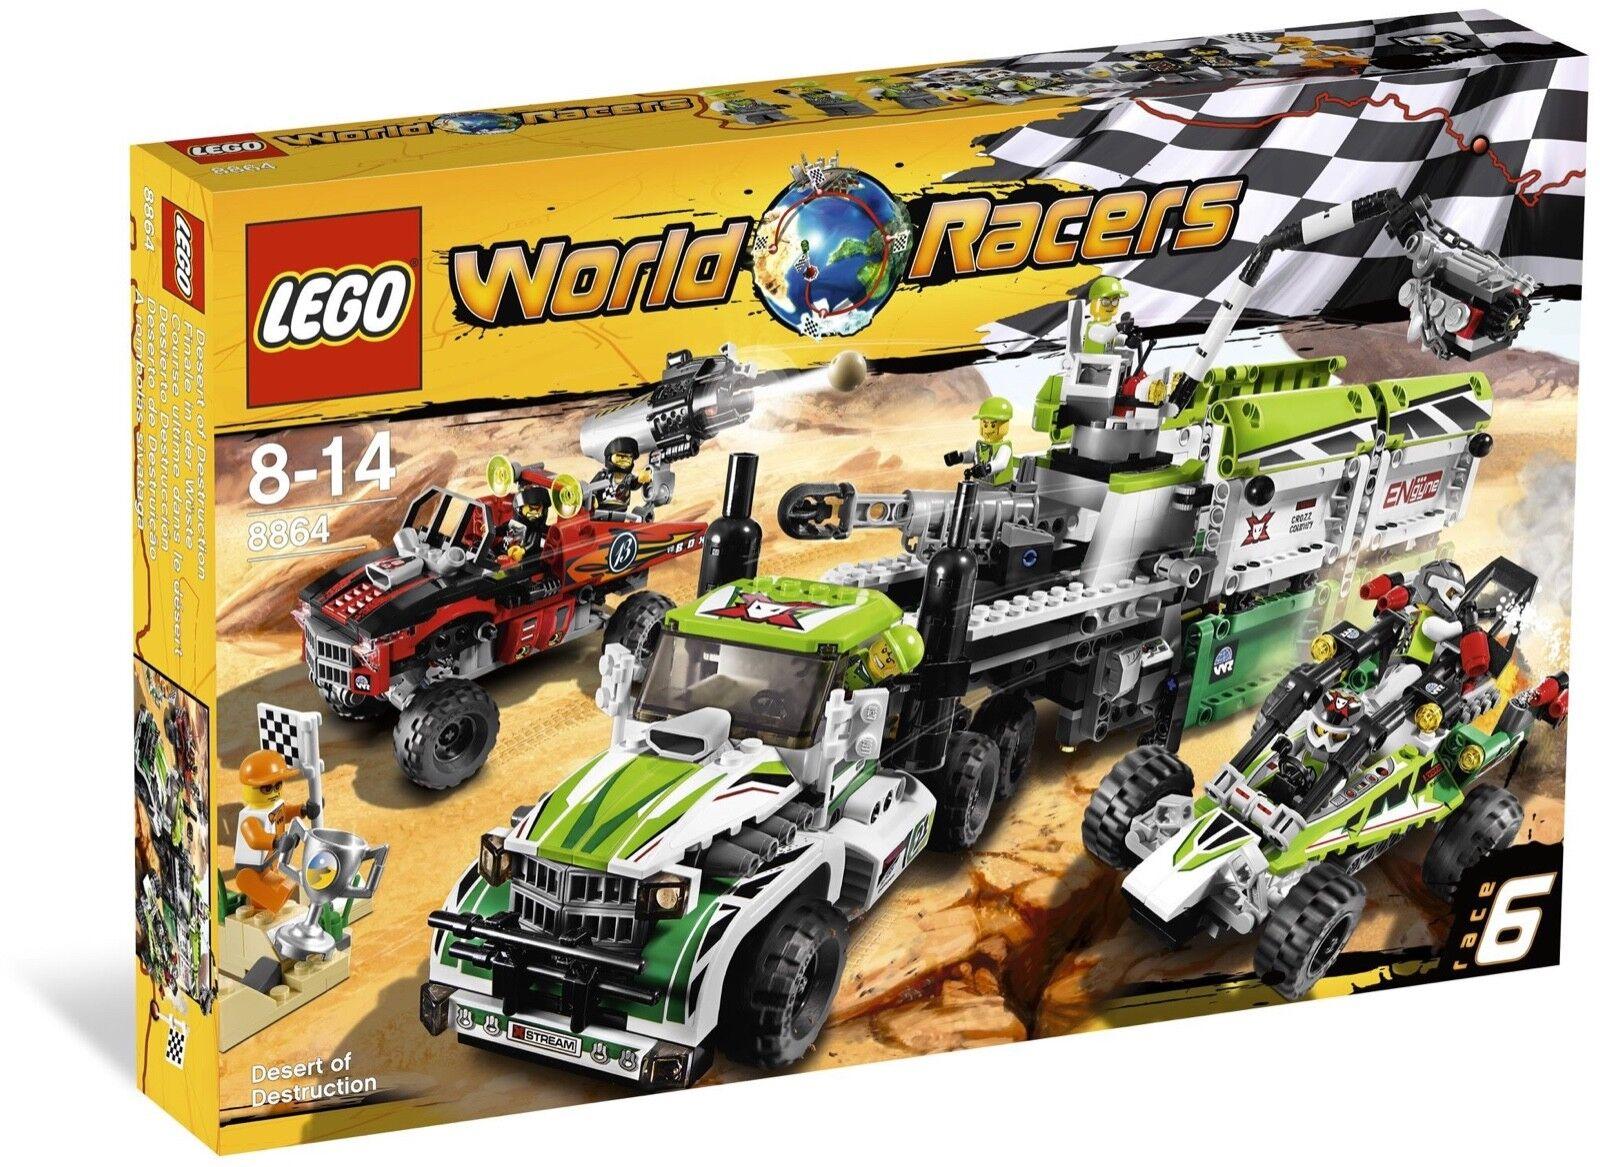 LEGO® World Racers 8864 Finale in der Wüste NEU OVP_ Desert of Destruction NEW